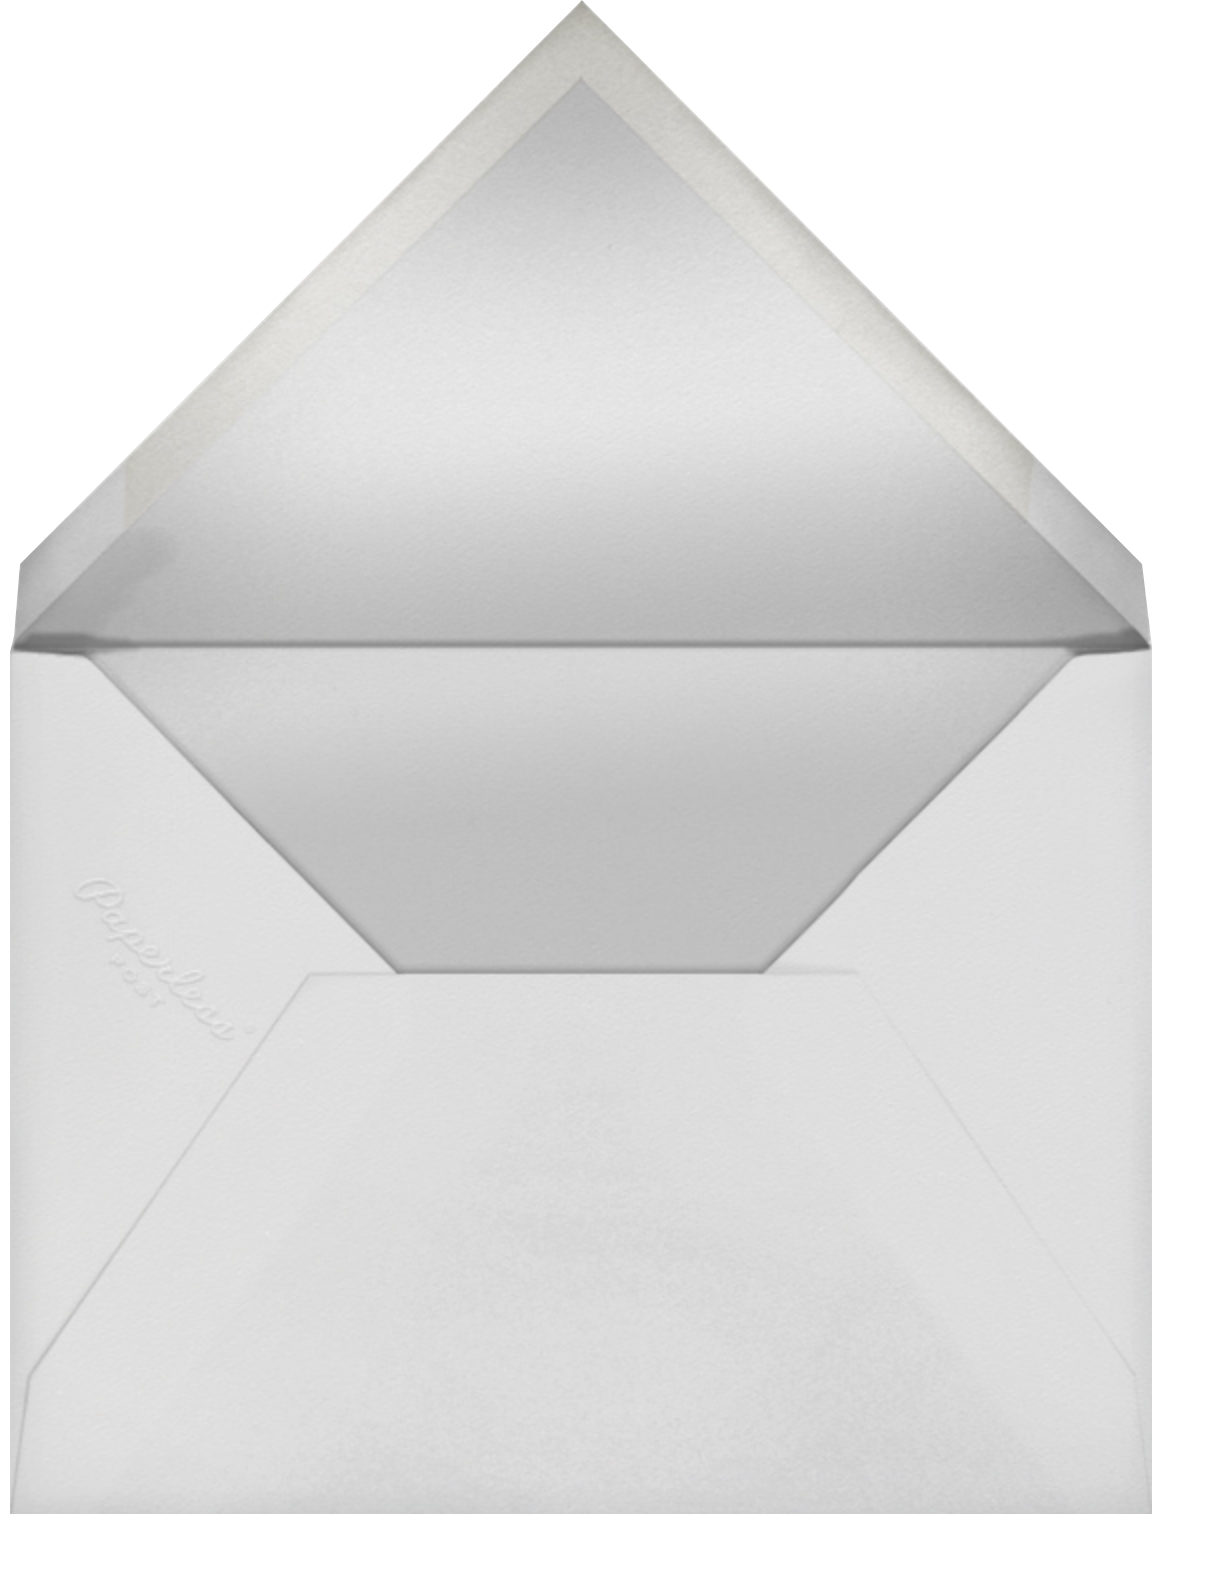 March Herbarium (Menu) - Rifle Paper Co. - Menus - envelope back